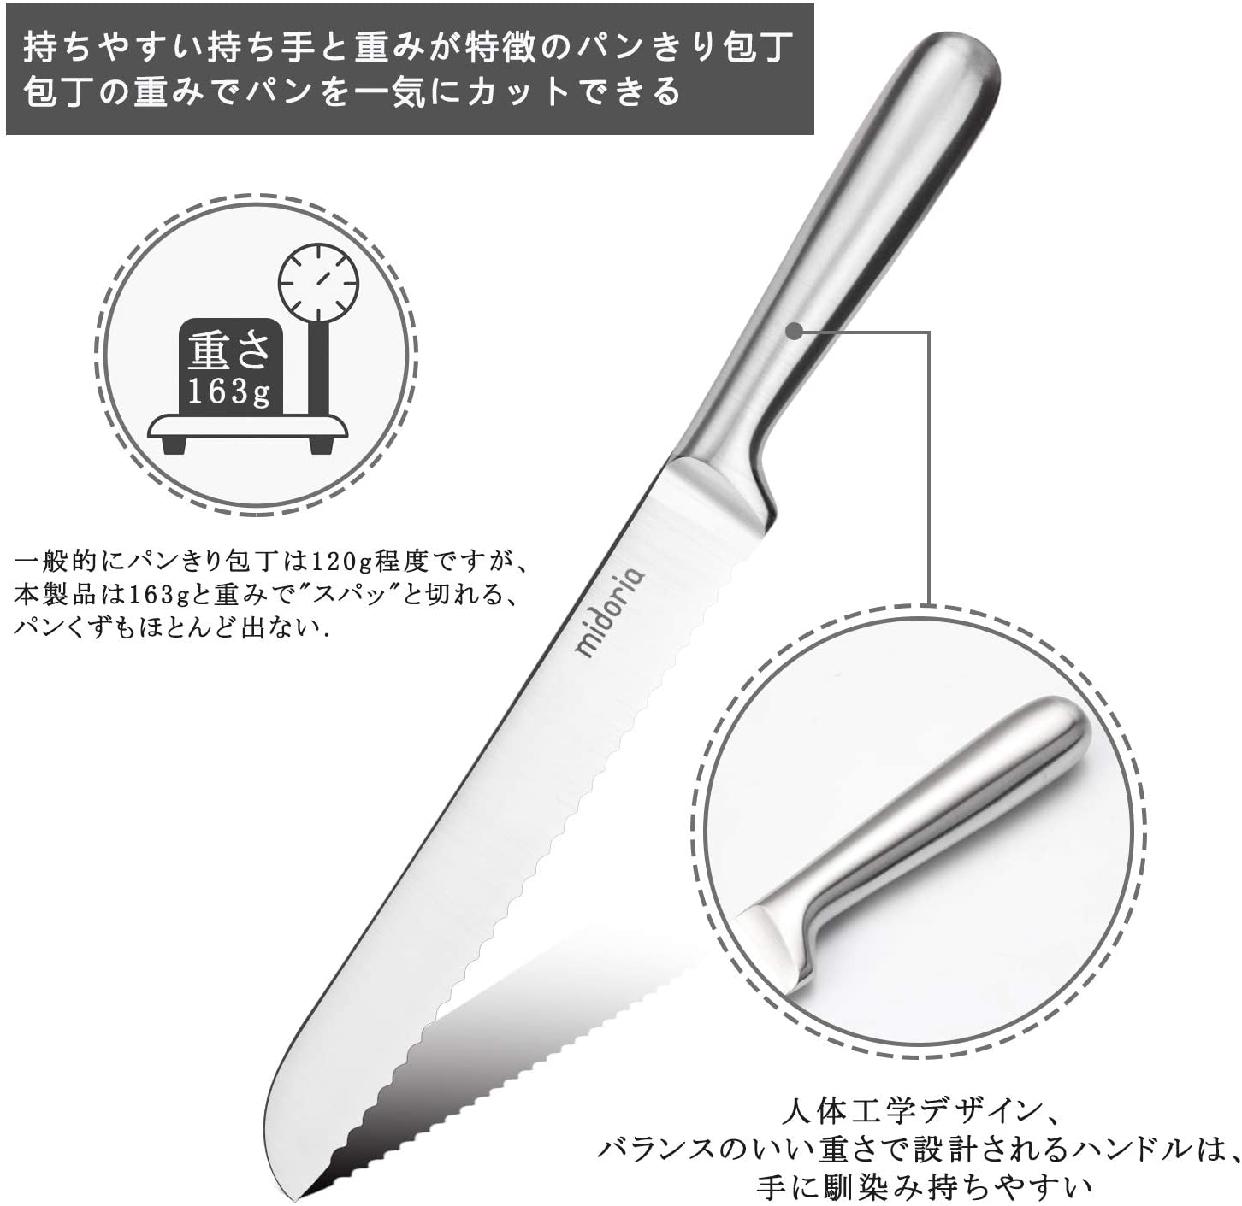 MIDORIA(ミドリア) パン切りナイフ シルバーの商品画像3